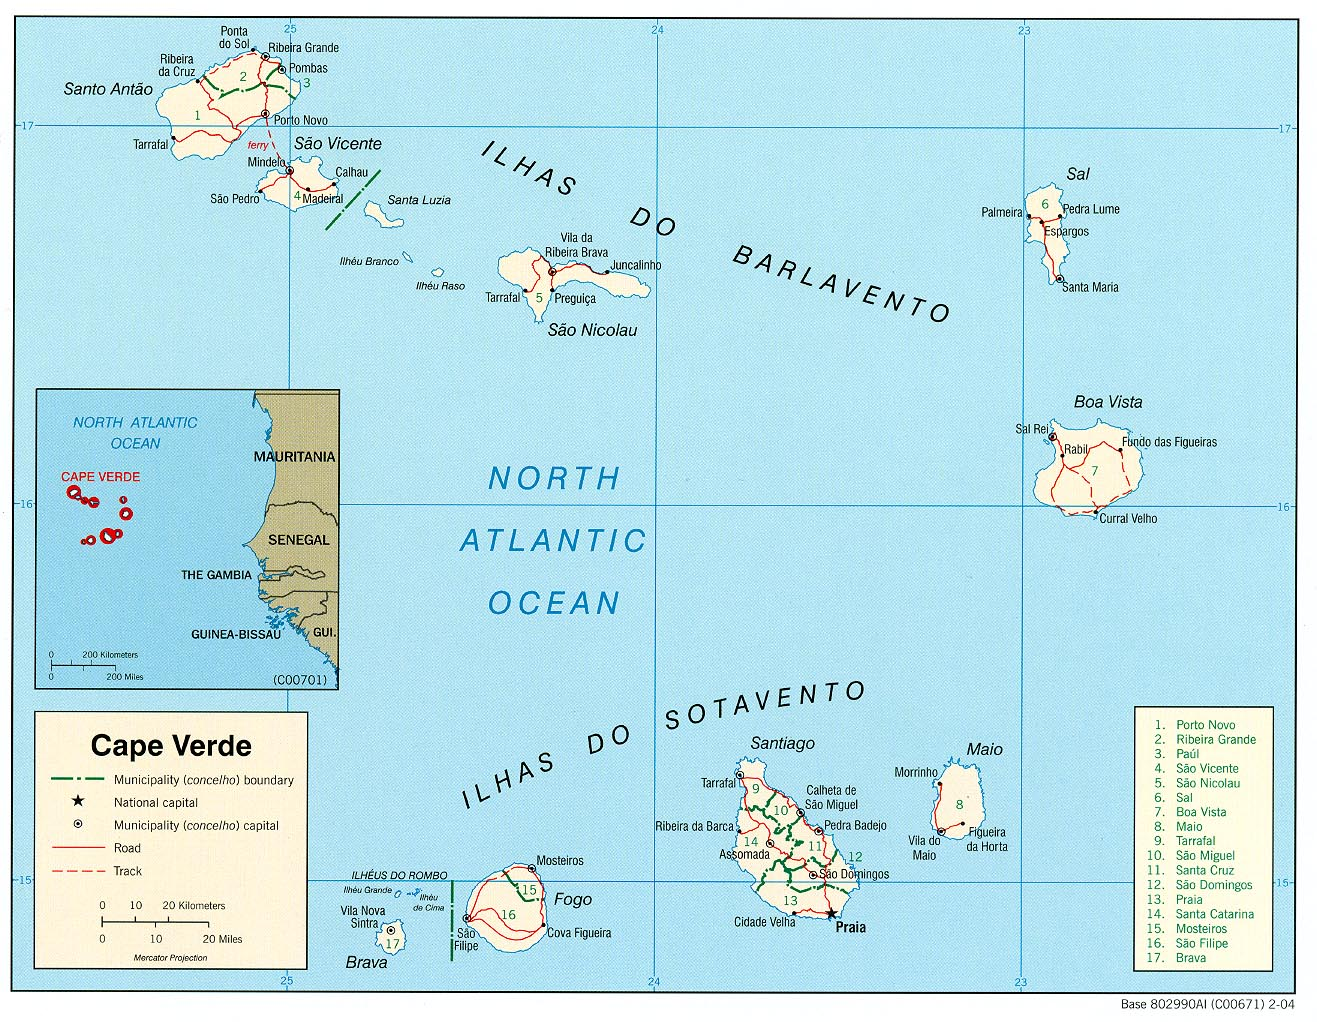 Mapa Politico de Cabo Verde